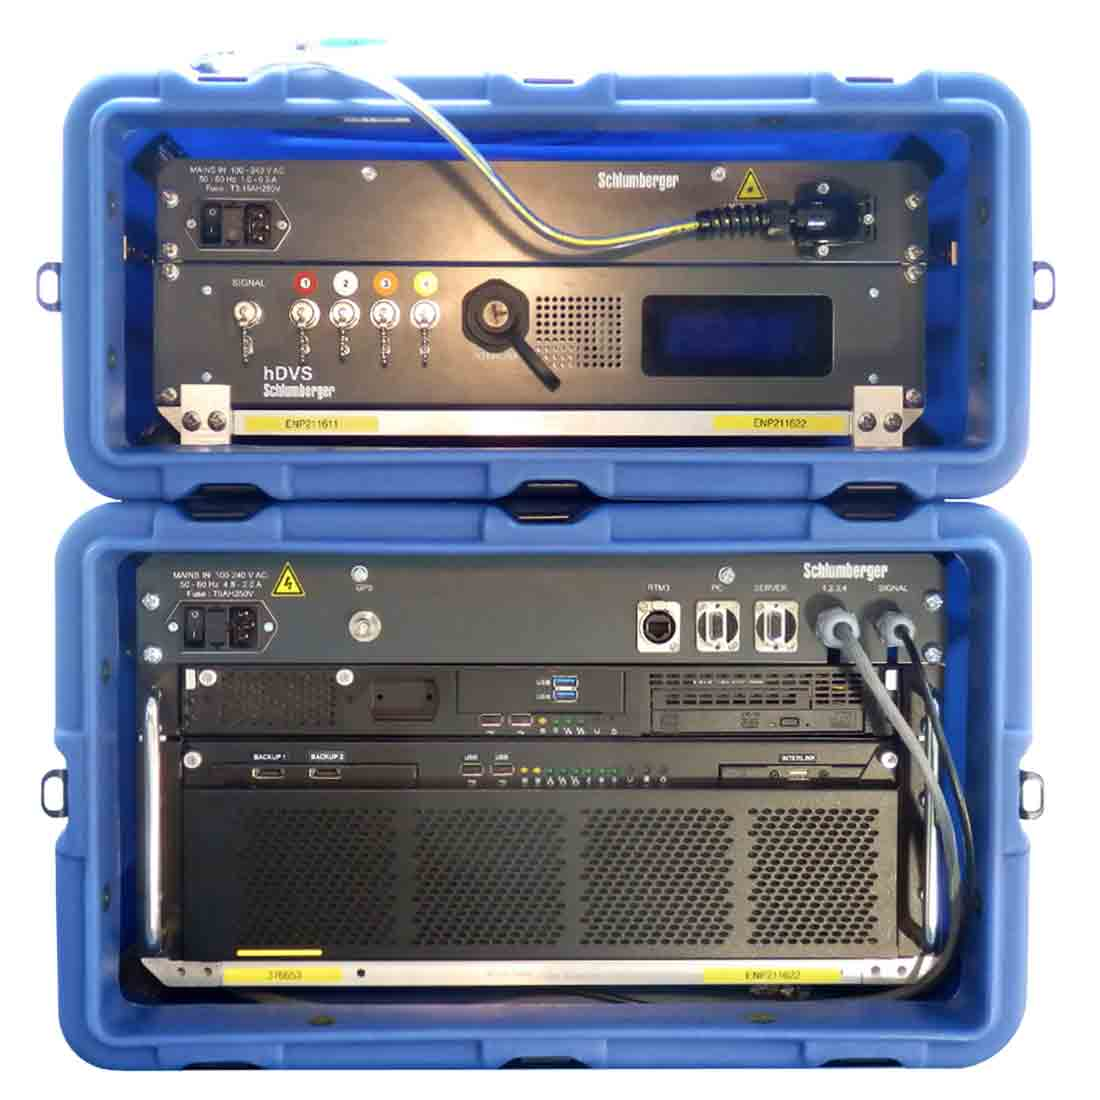 Interrogator unit of the hDVS DAS system.